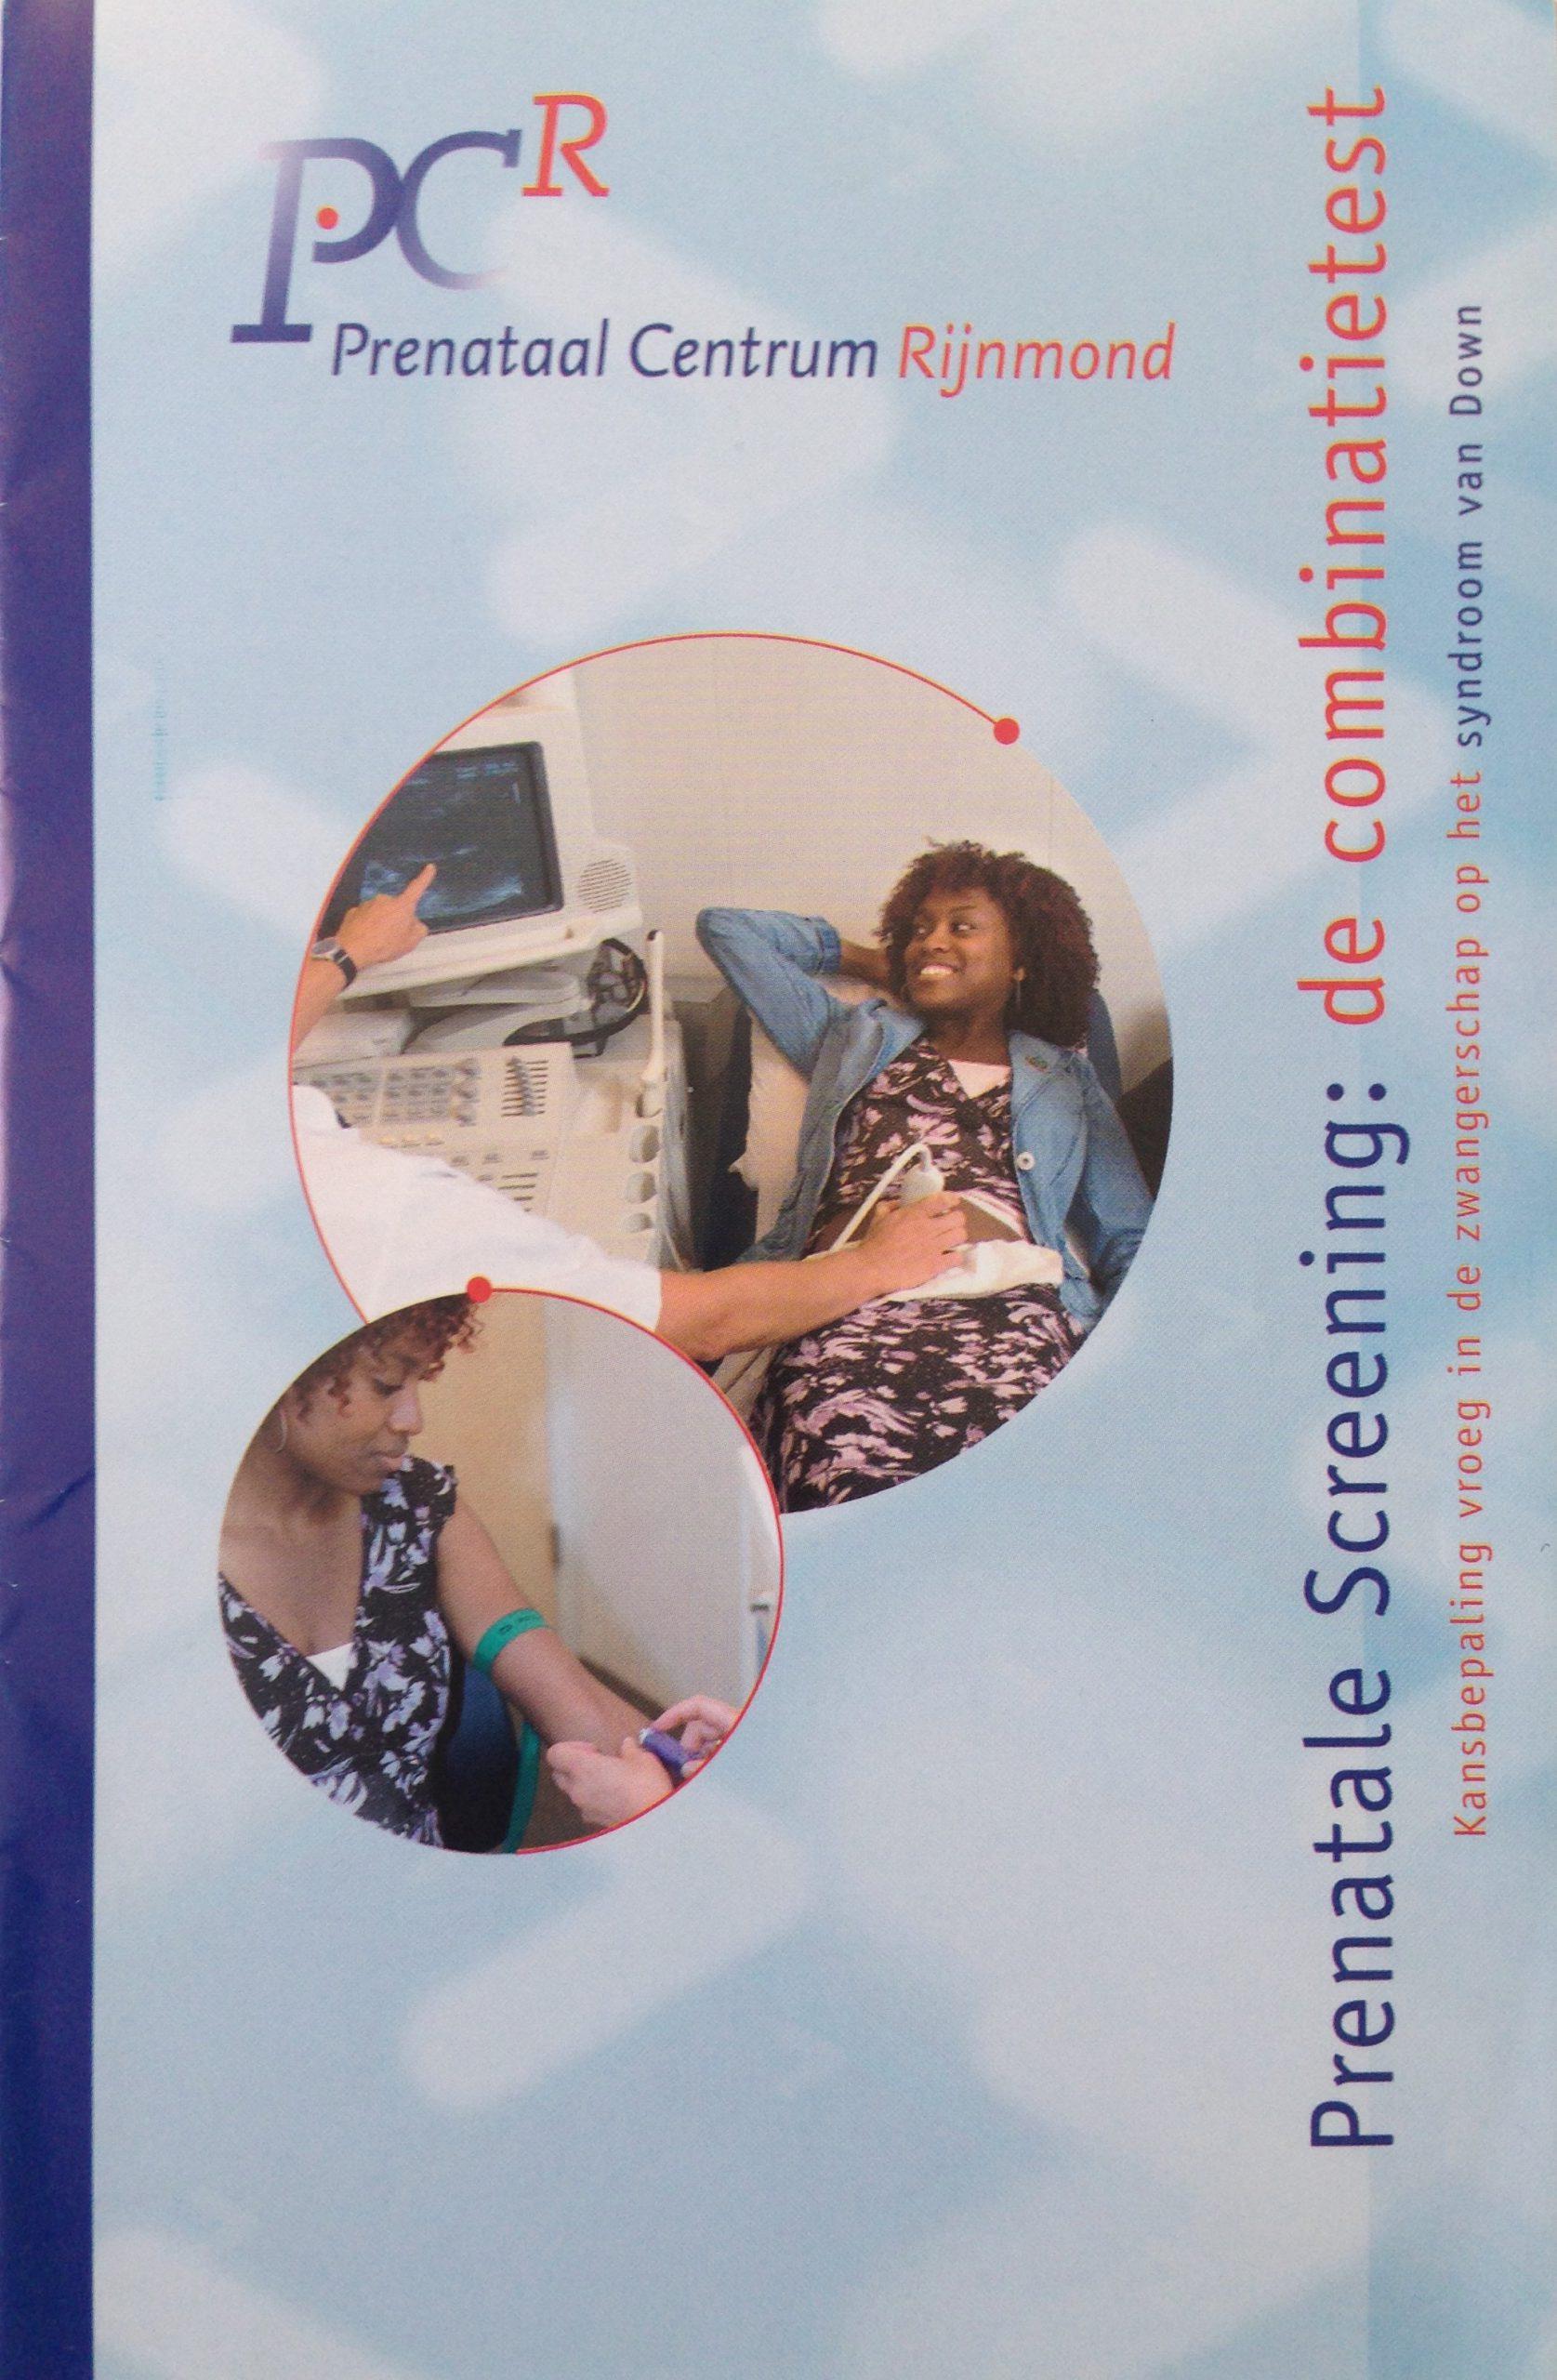 Brochure: Prenataal Centrum Rijnmond